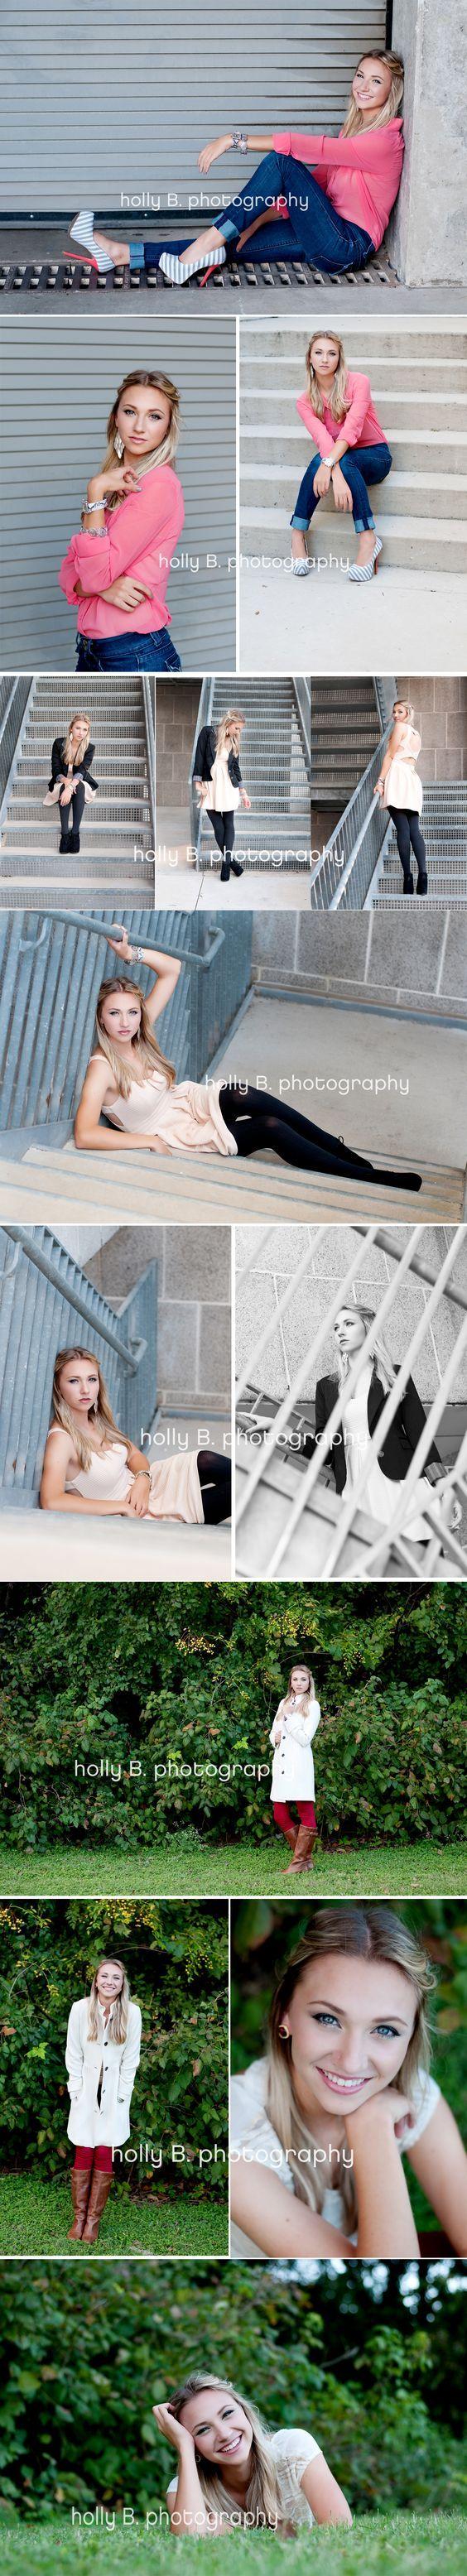 austin senior portrait photographer, senior portraits, holly B. photography, senior posing, senior girl posing, urban senior photos